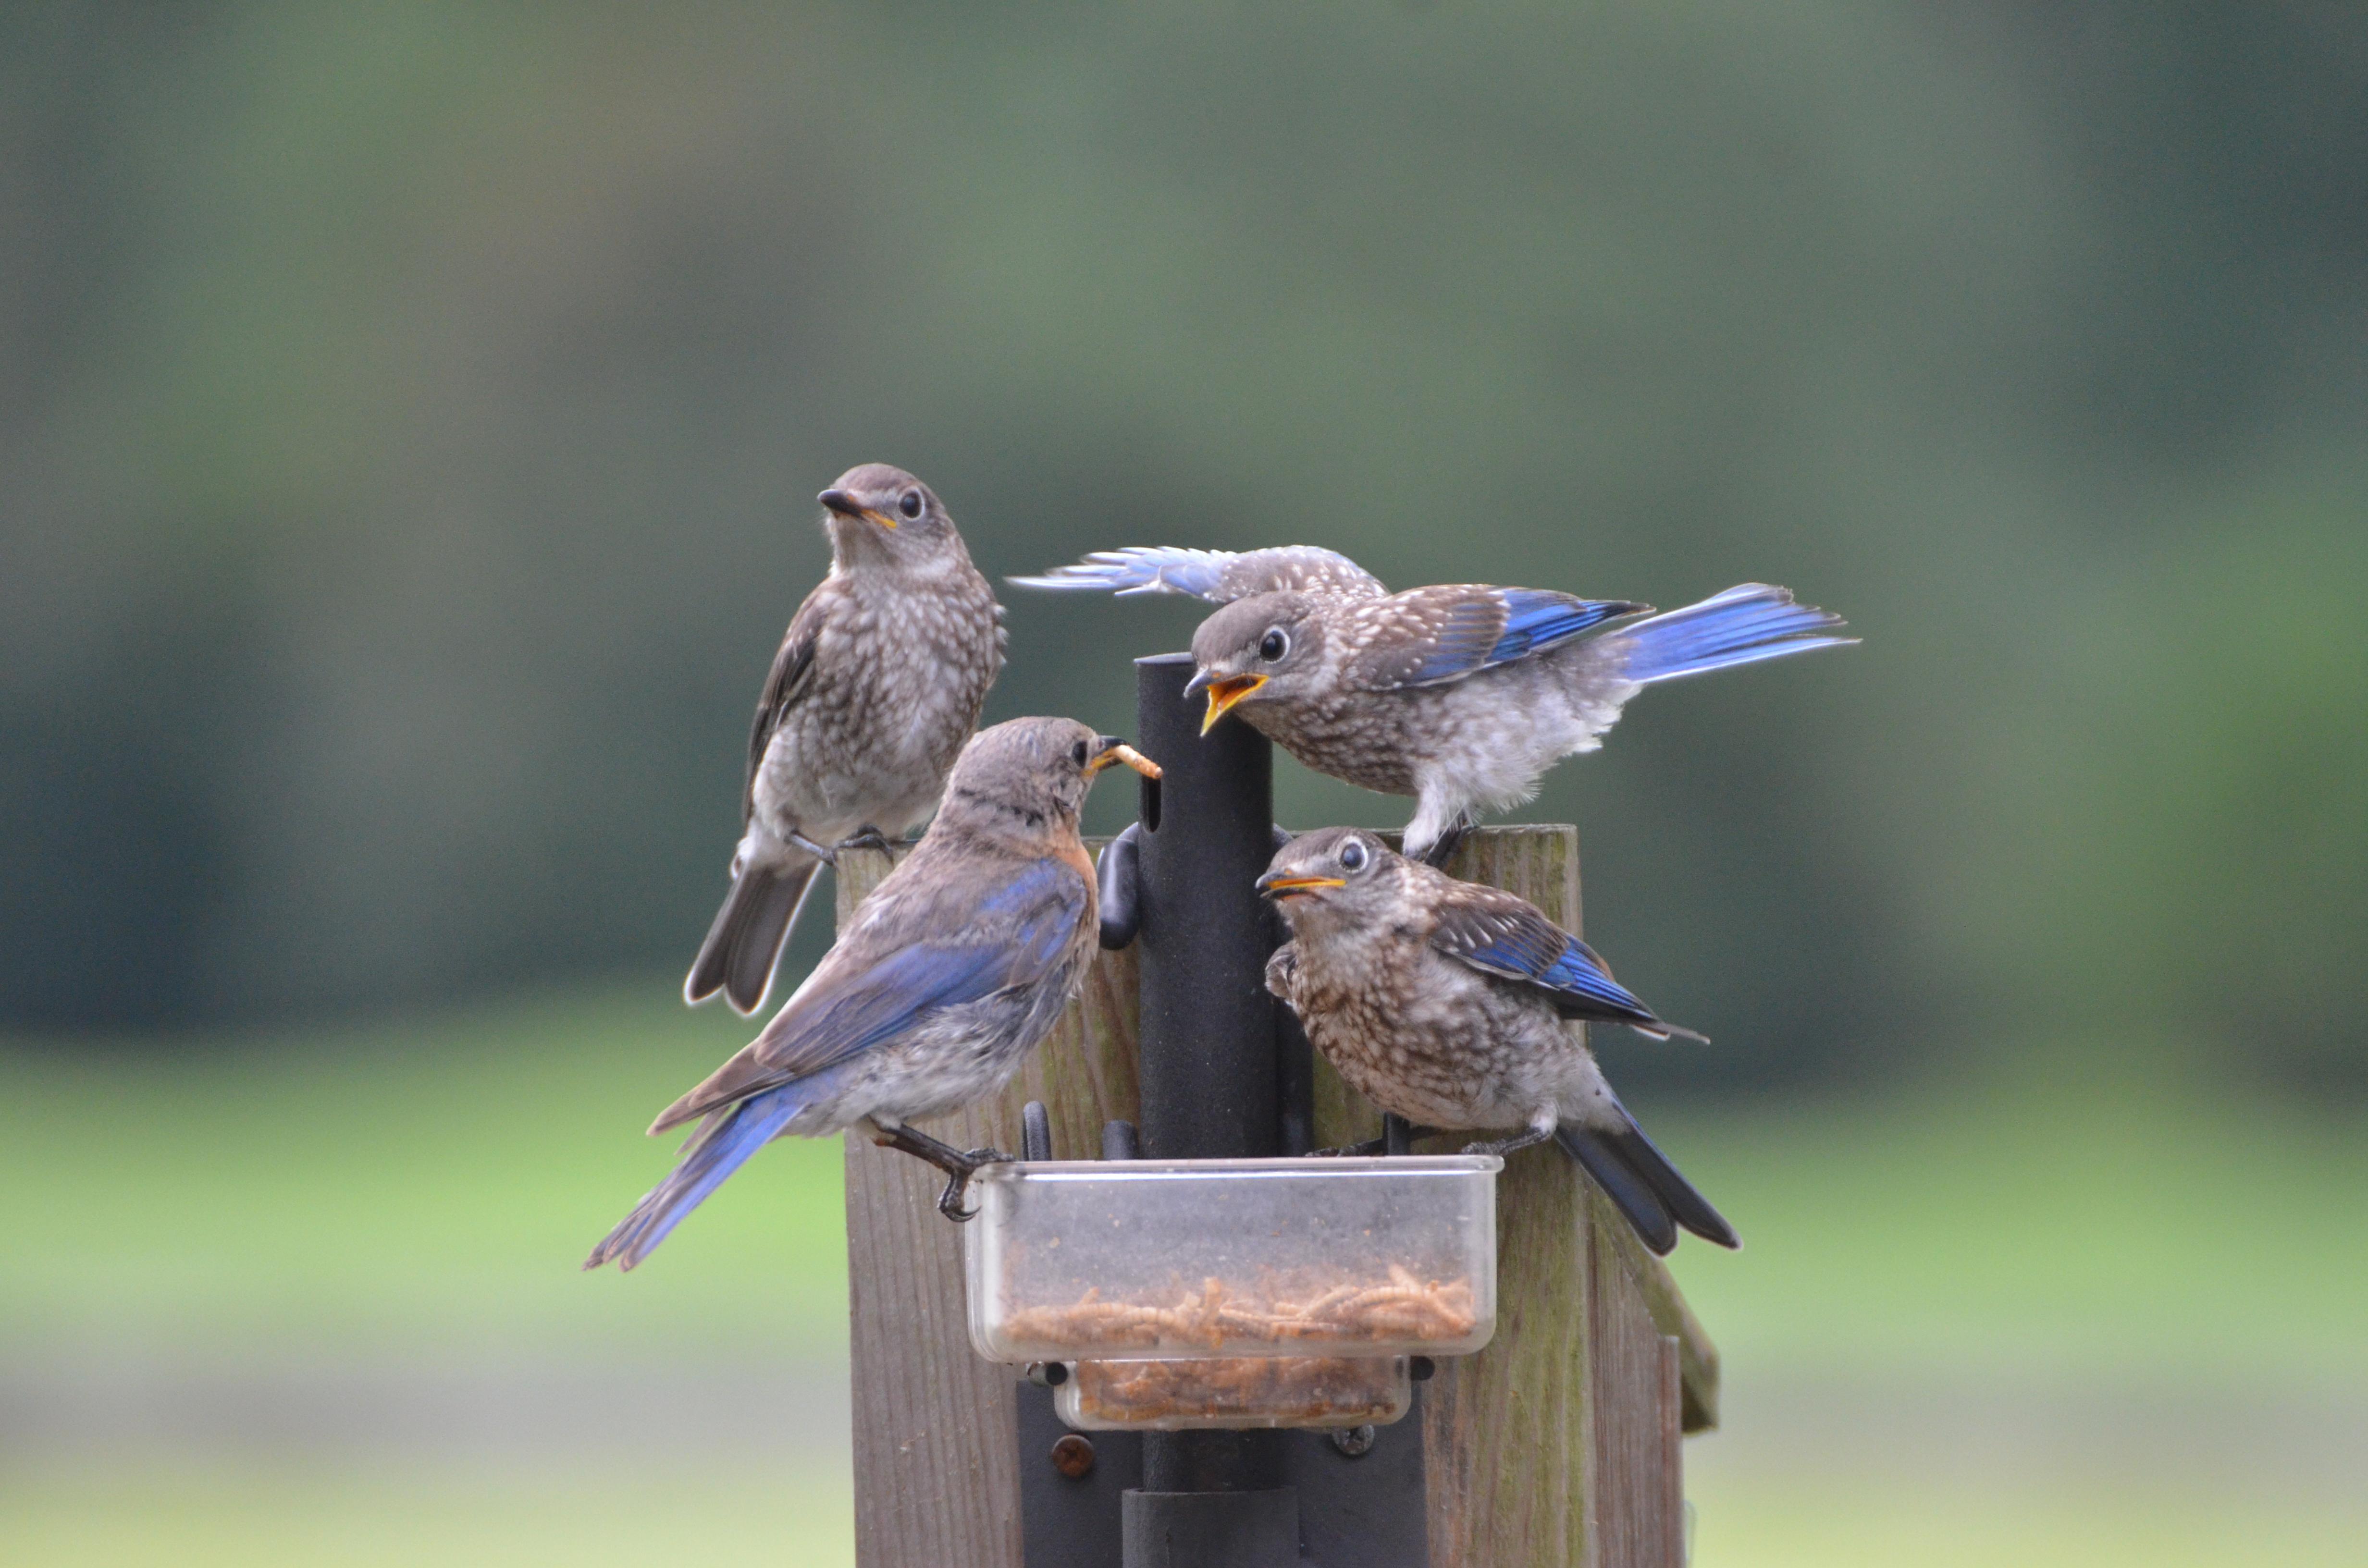 stock hanging video fat blue videoblocks feeders bird at feeder balls from footage tit british pecking a